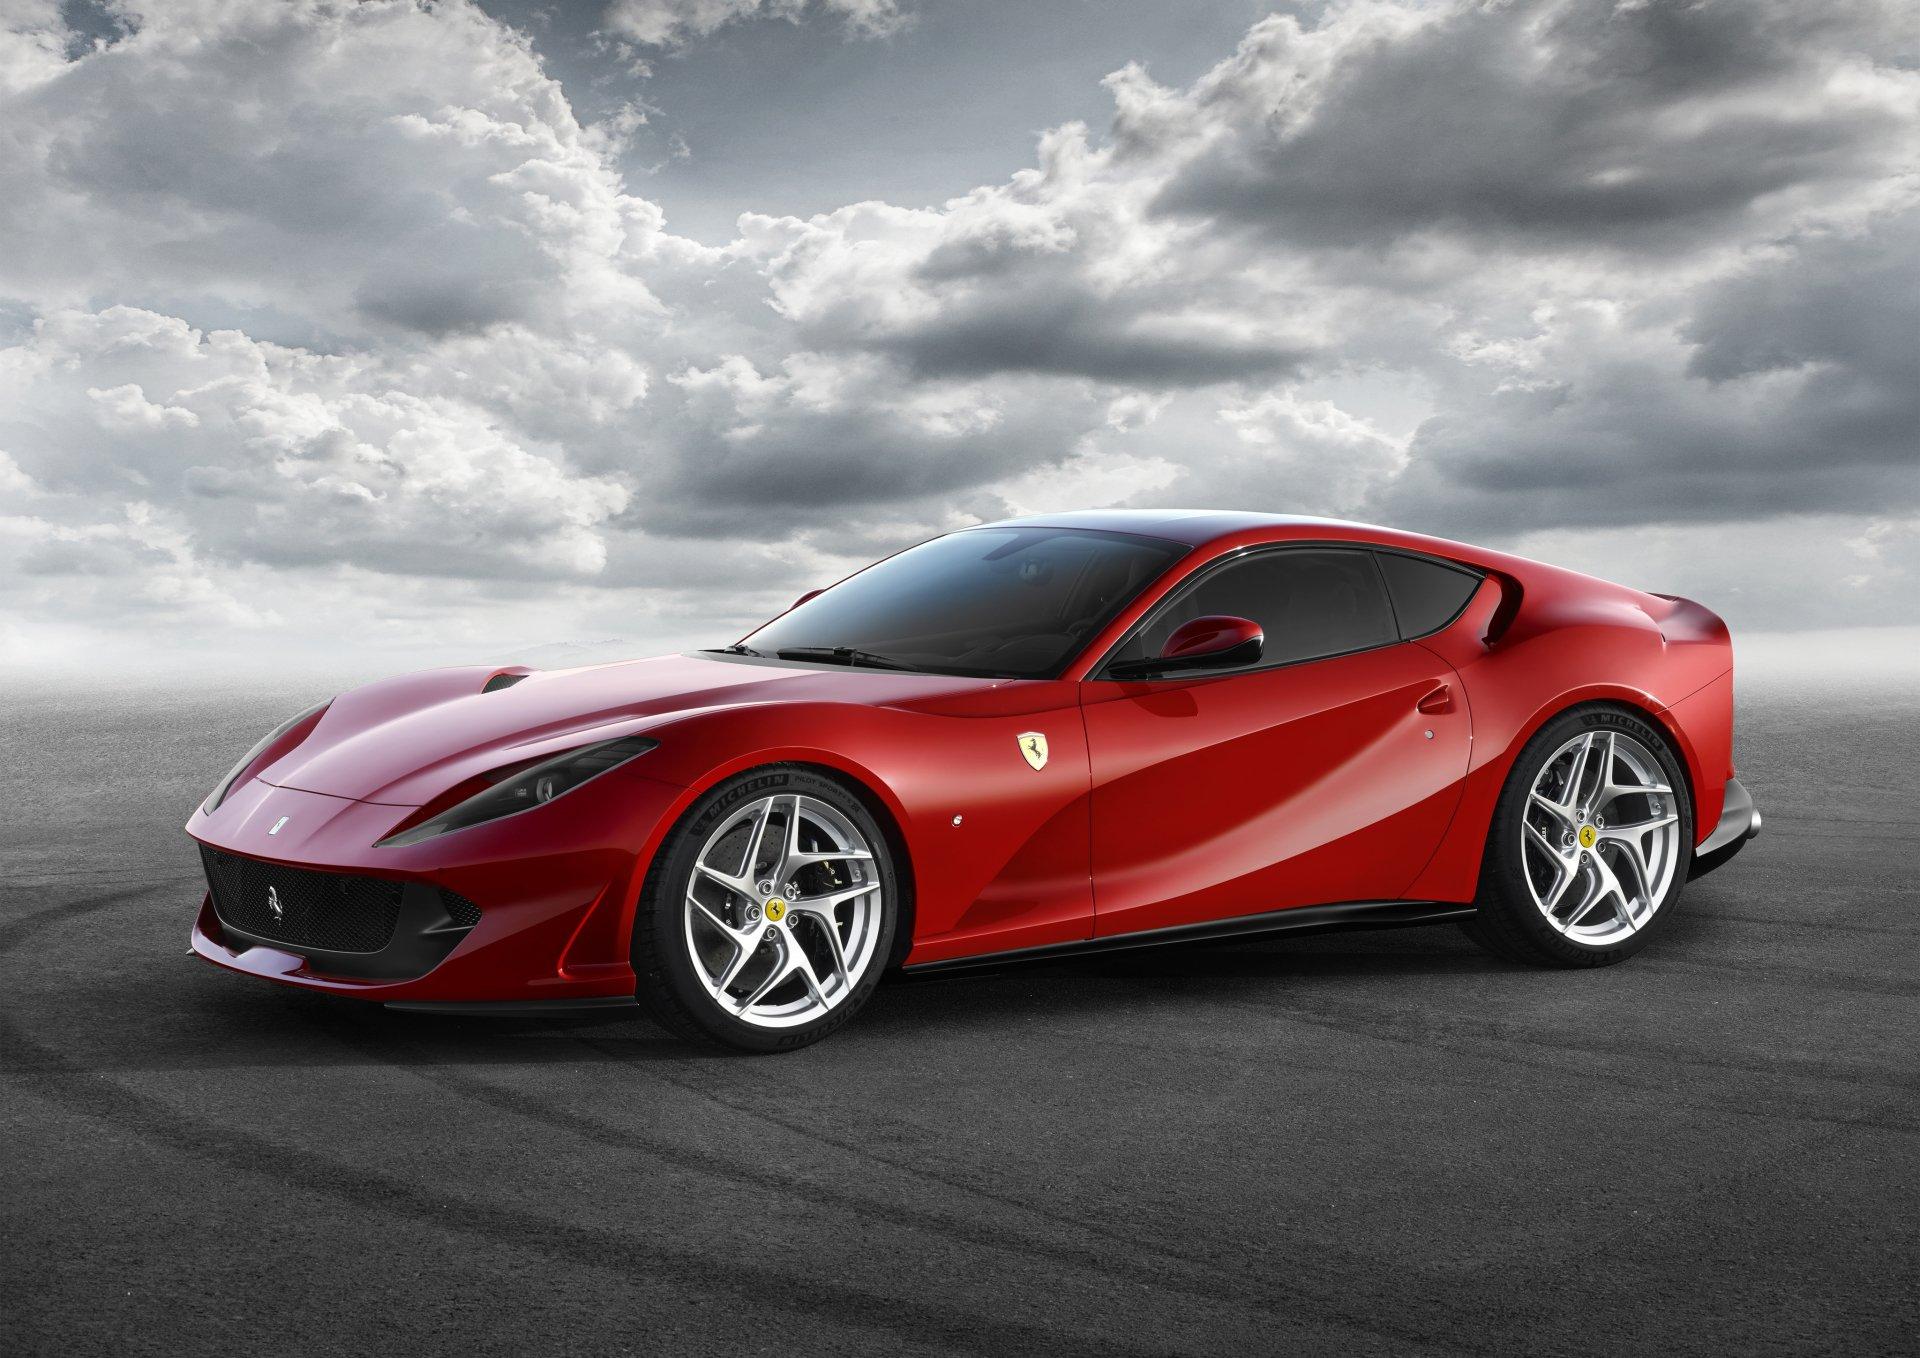 51 Ferrari 812 Superfast Fondos De Pantalla Hd Fondos De Escritorio Wallpaper Abyss